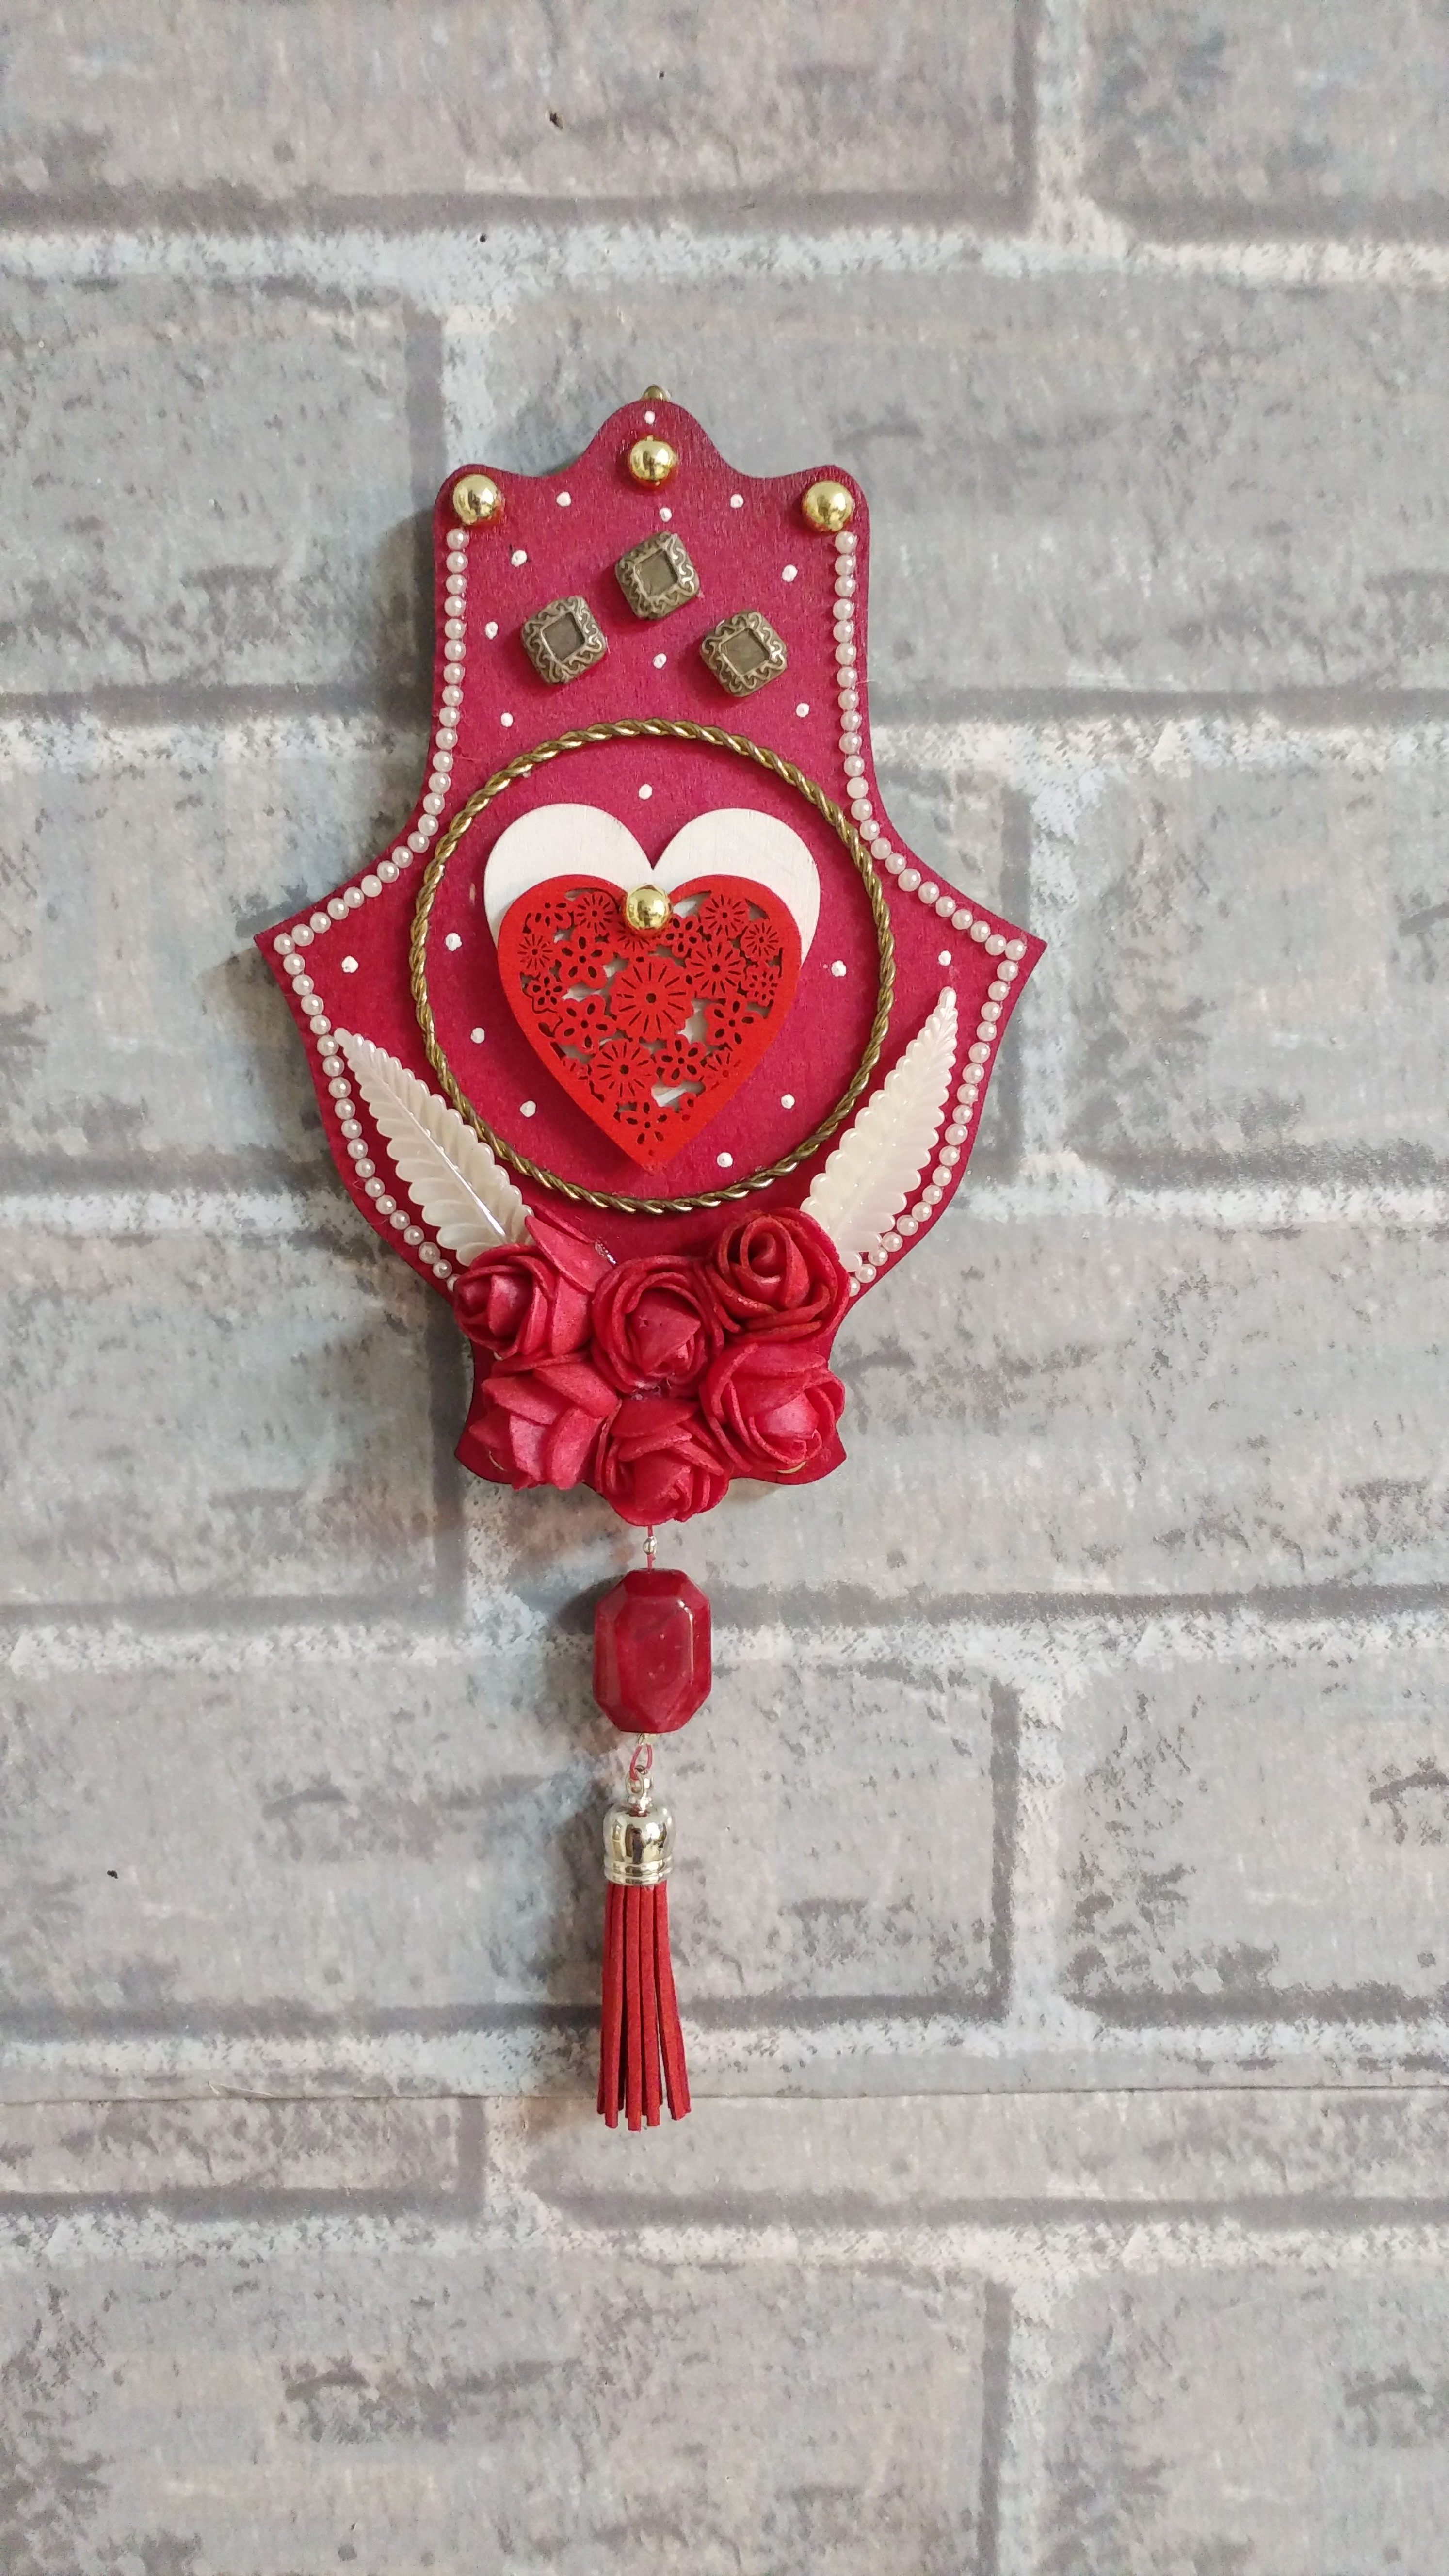 hangings luck good judaica wooden decor gift housewarming jewish chamsa wall home red hanging hamsa living room décor charm art